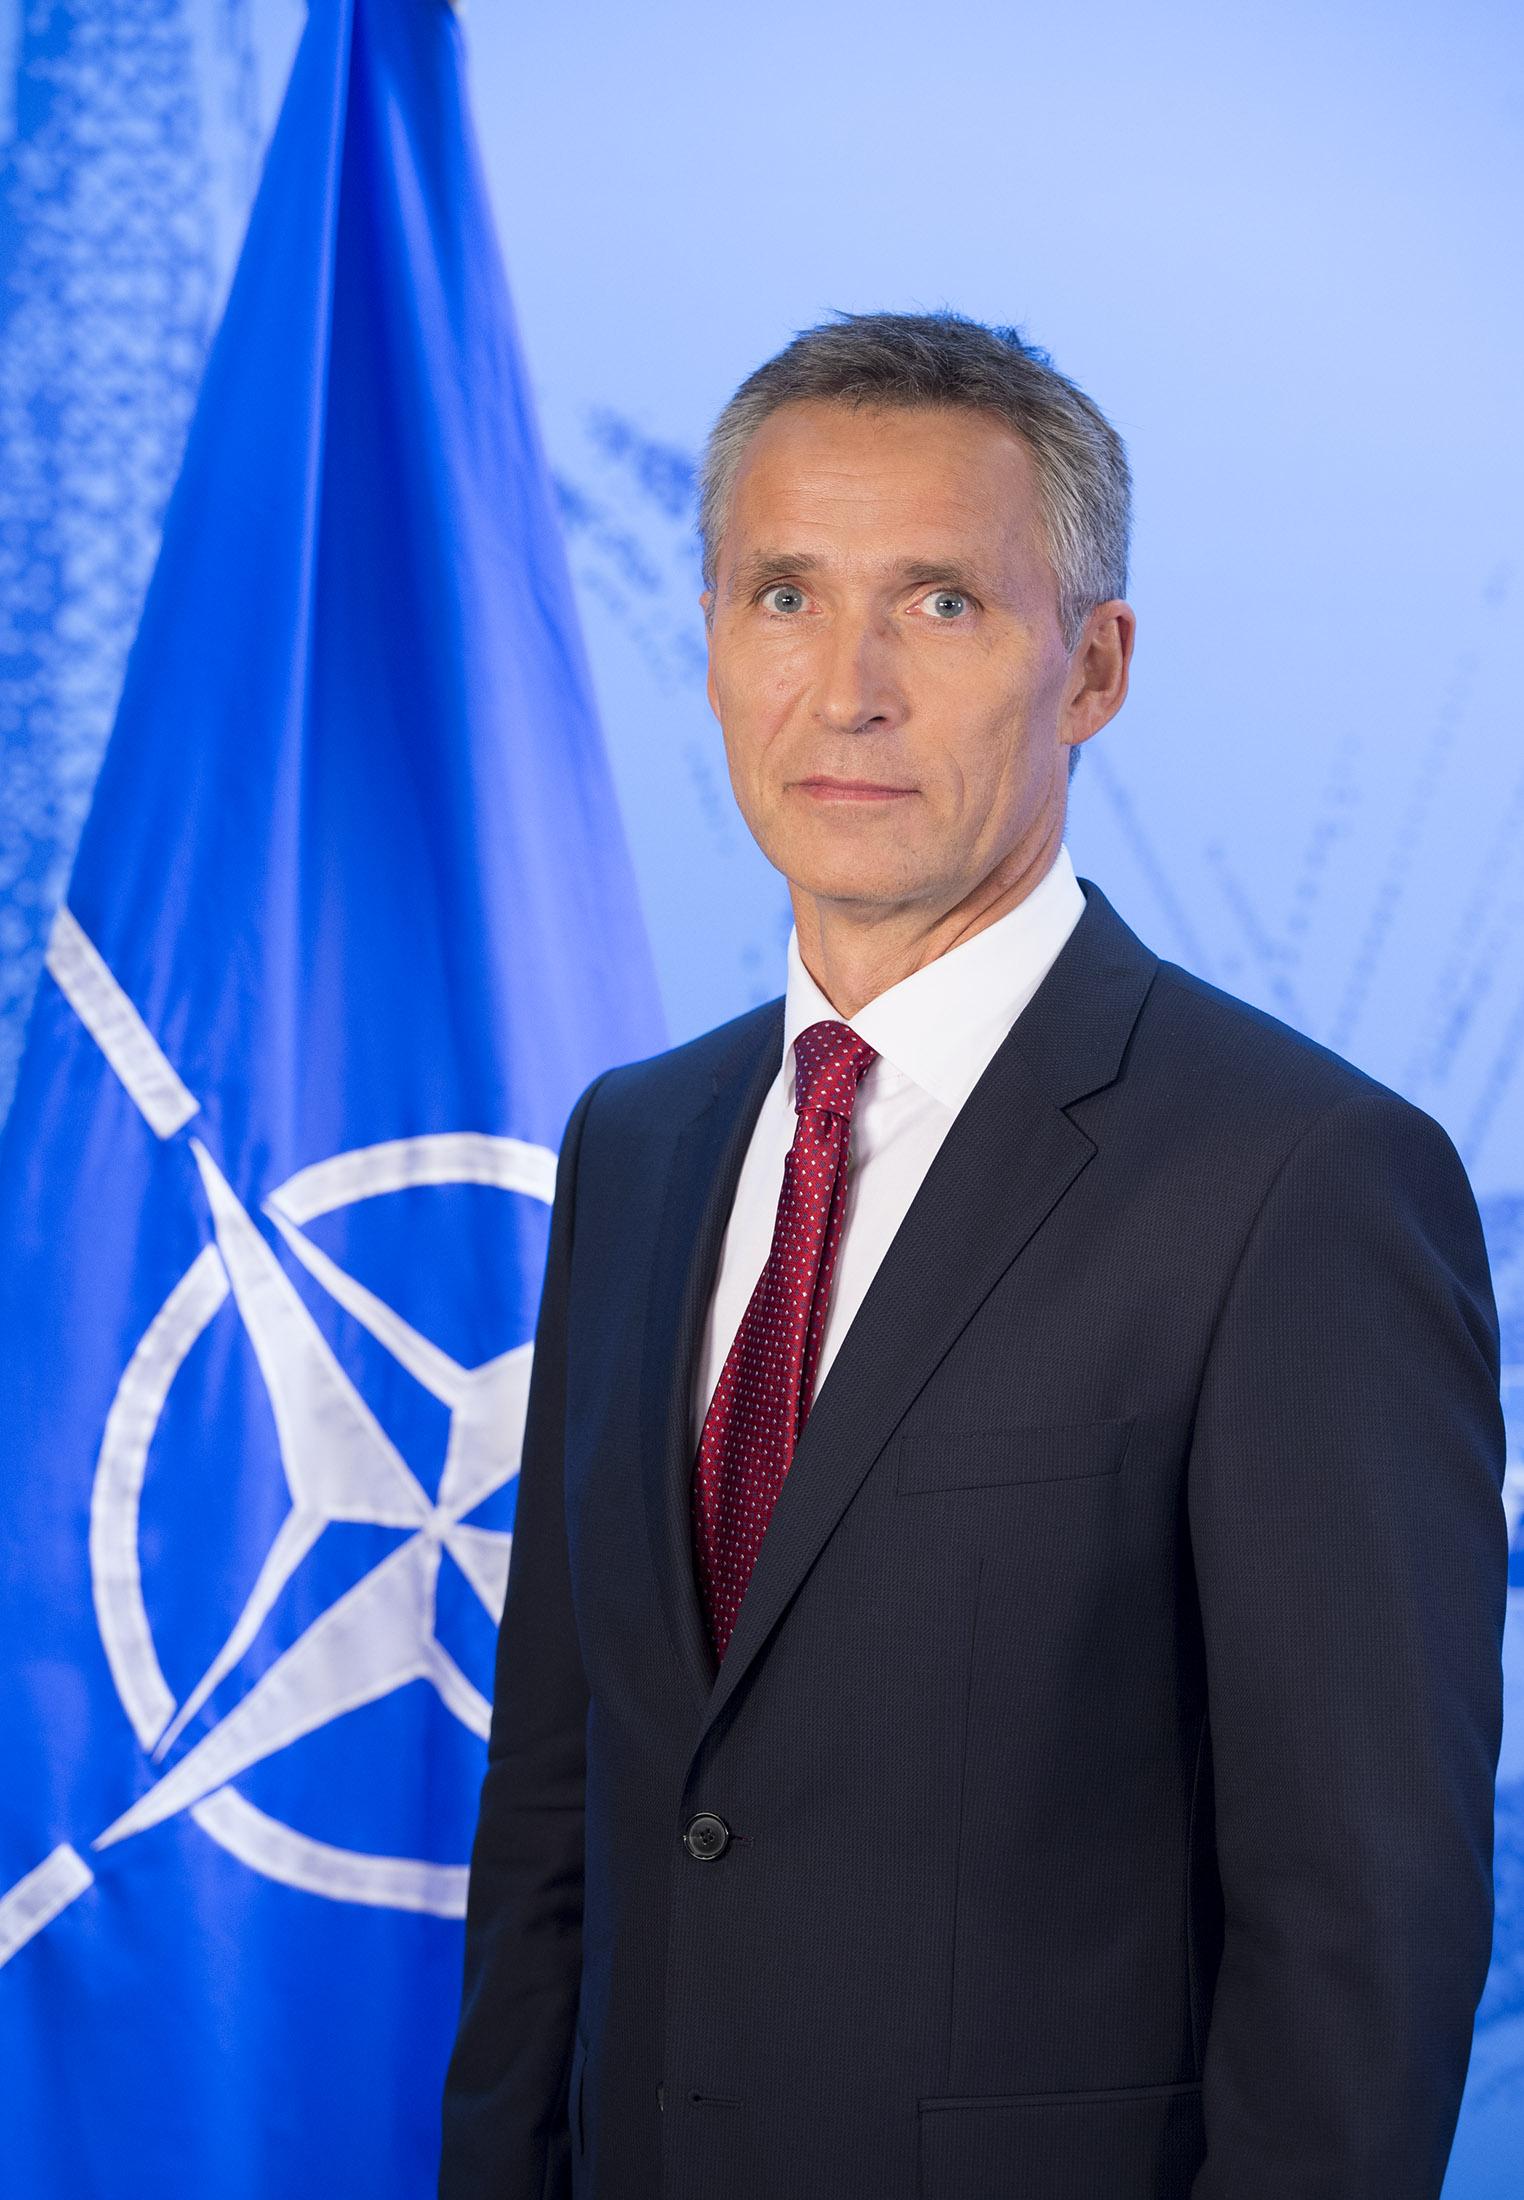 Szef NATO: Wszyscy sojusznicy poparli naloty na Syrię